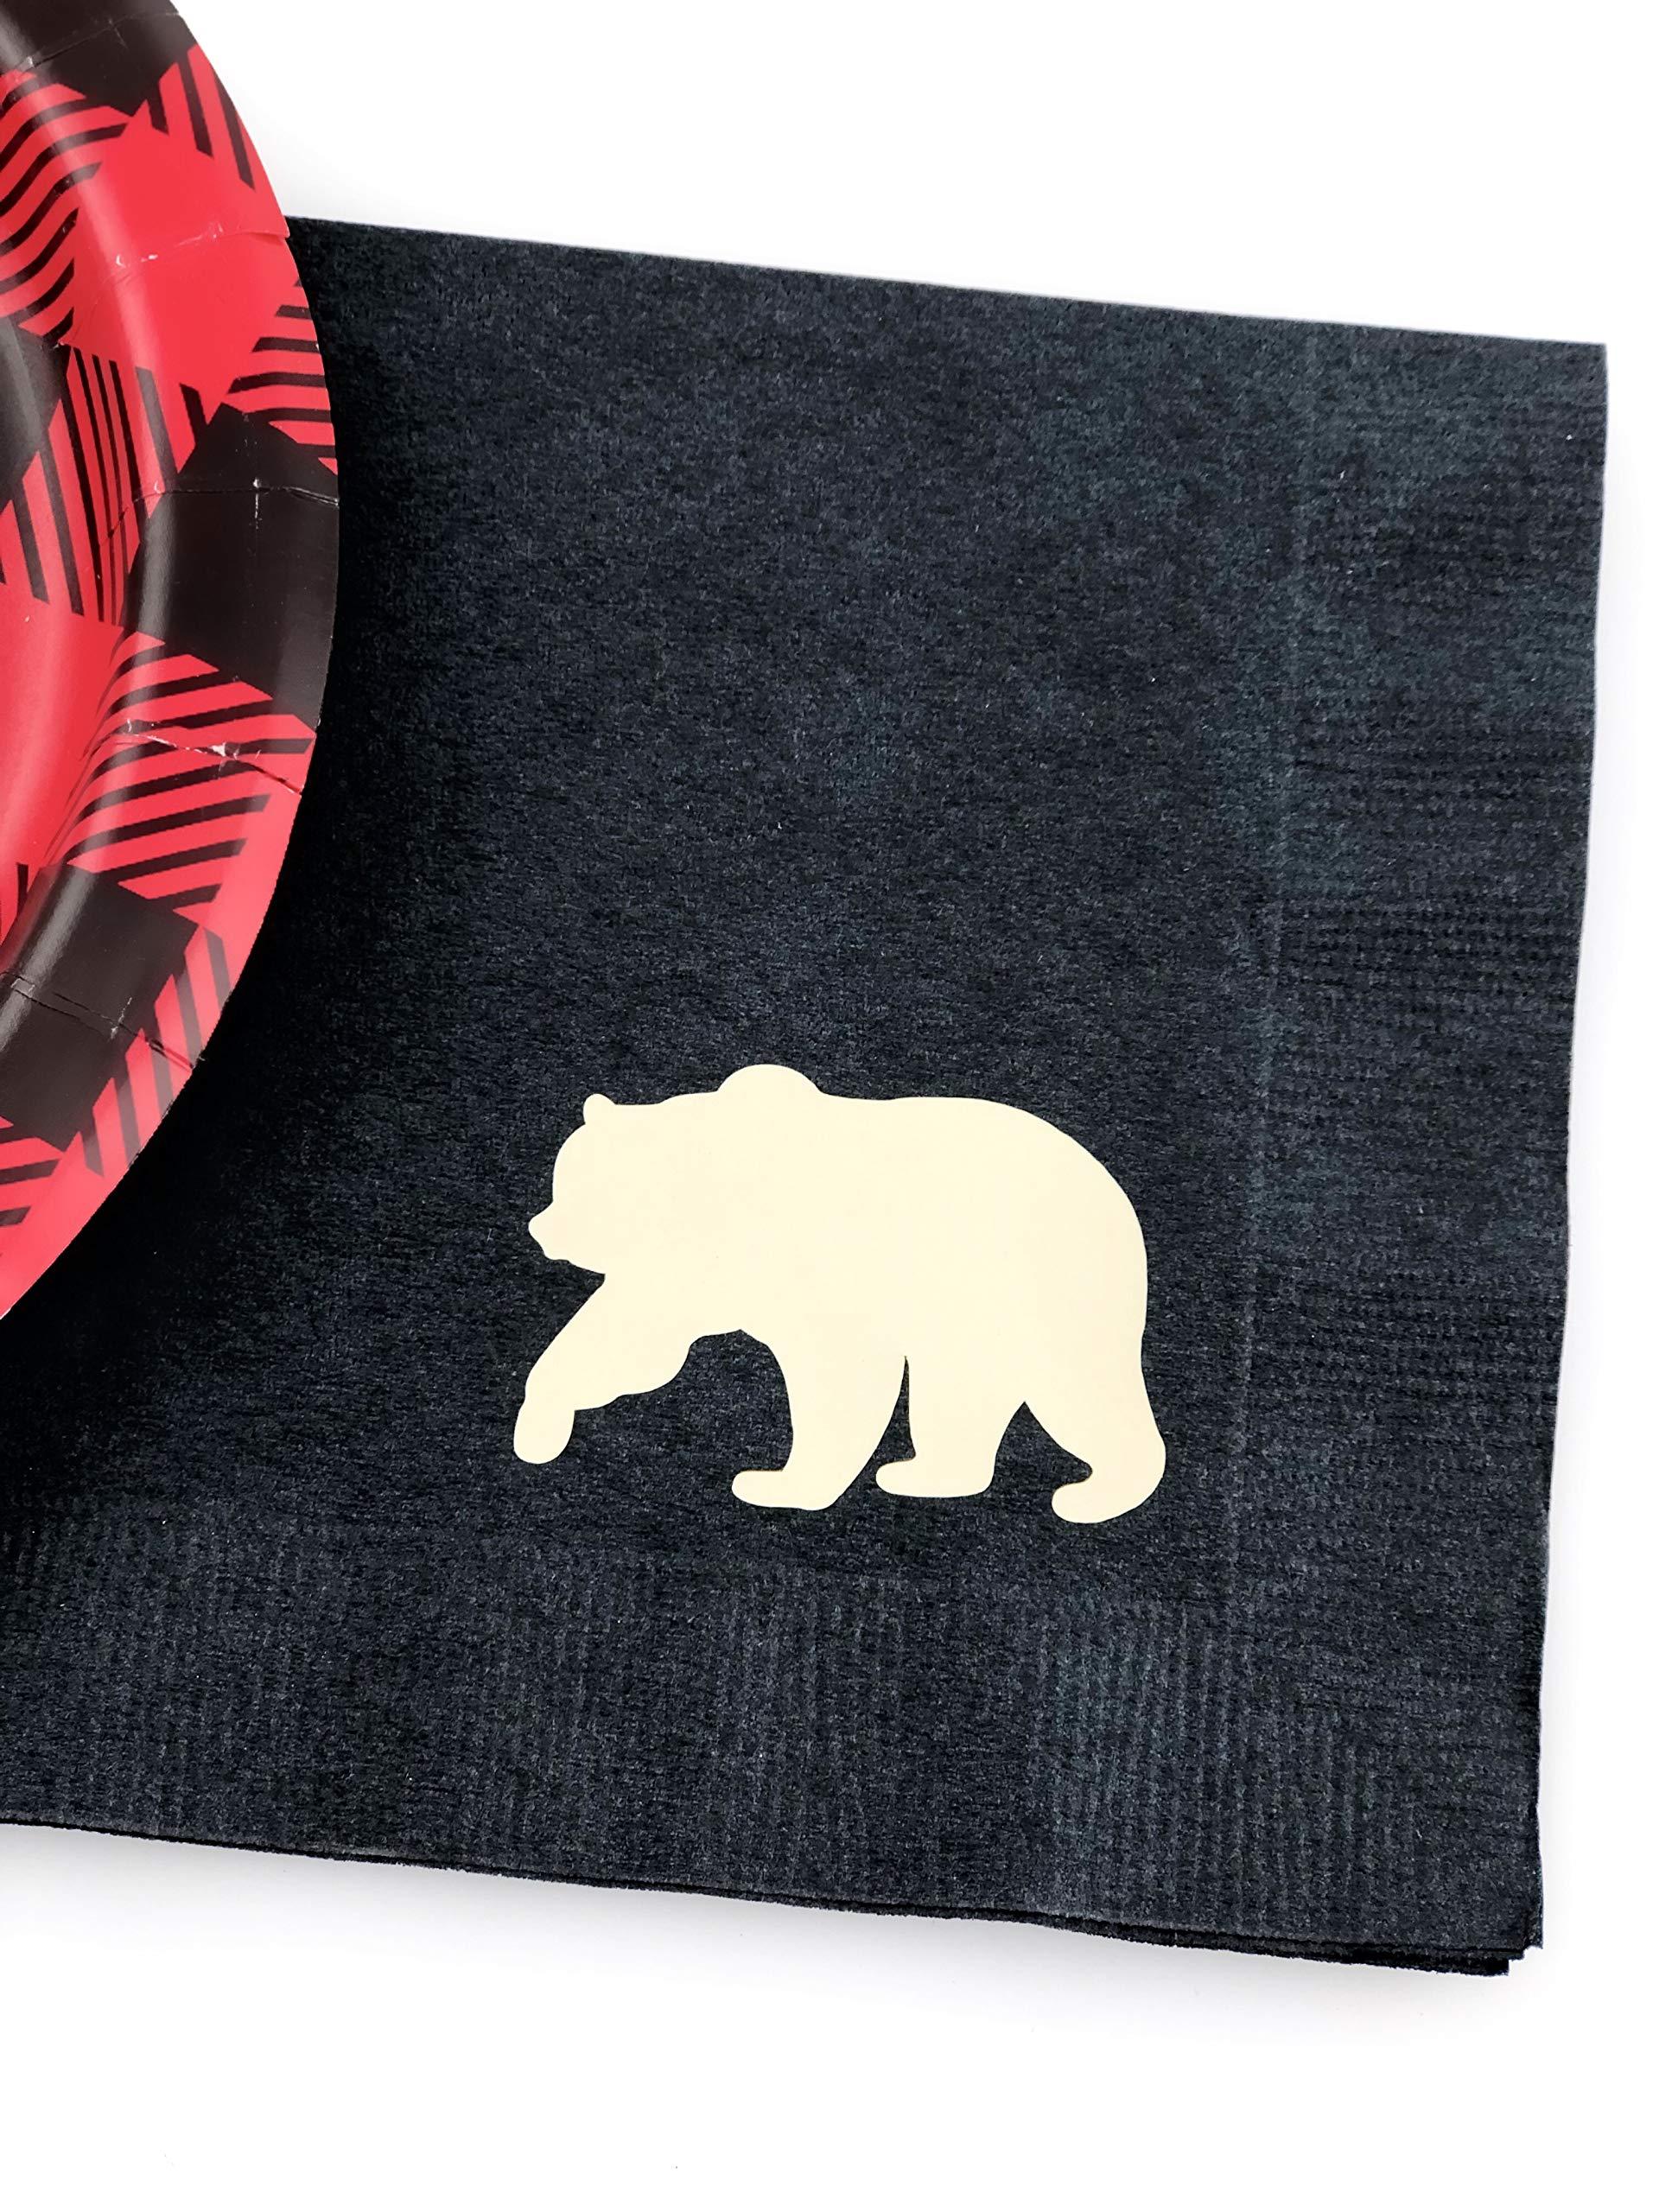 Buffalo Plaid Bear Party Set - 16 Plates Napkins Lumberjack Birthday Baby Shower